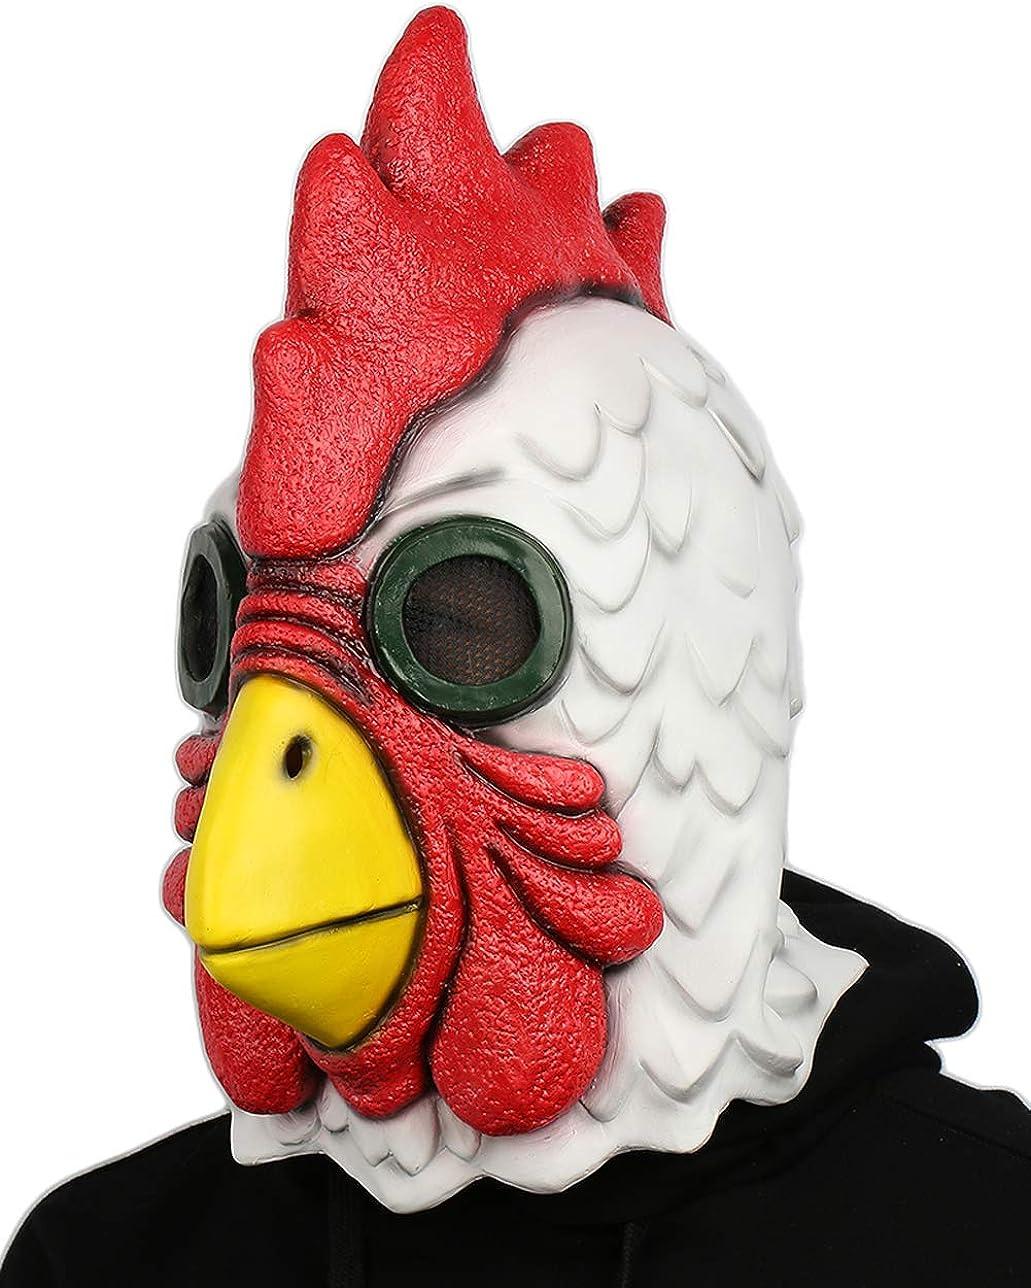 Cock Monkey Mask Deluxe Latex Full Head Cosplay Costume Prop